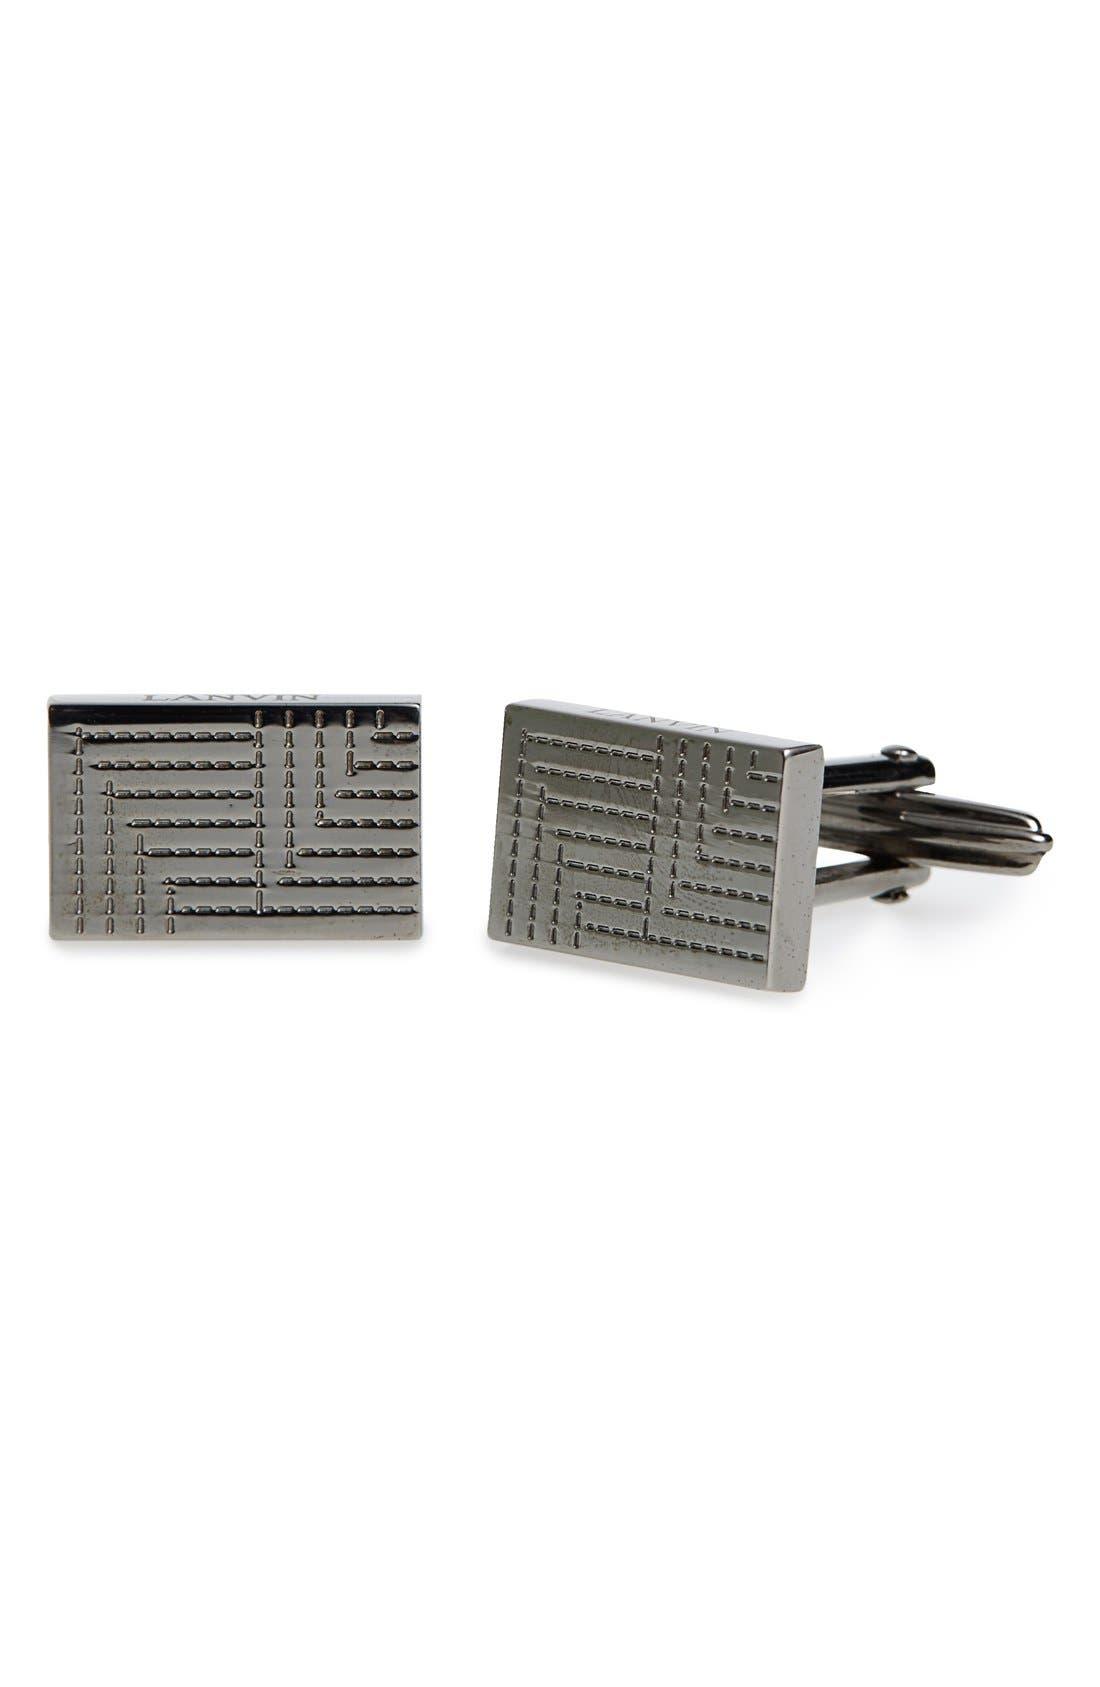 Alternate Image 1 Selected - Lanvin Textured Metal Plaque Rectangular Cuff Links